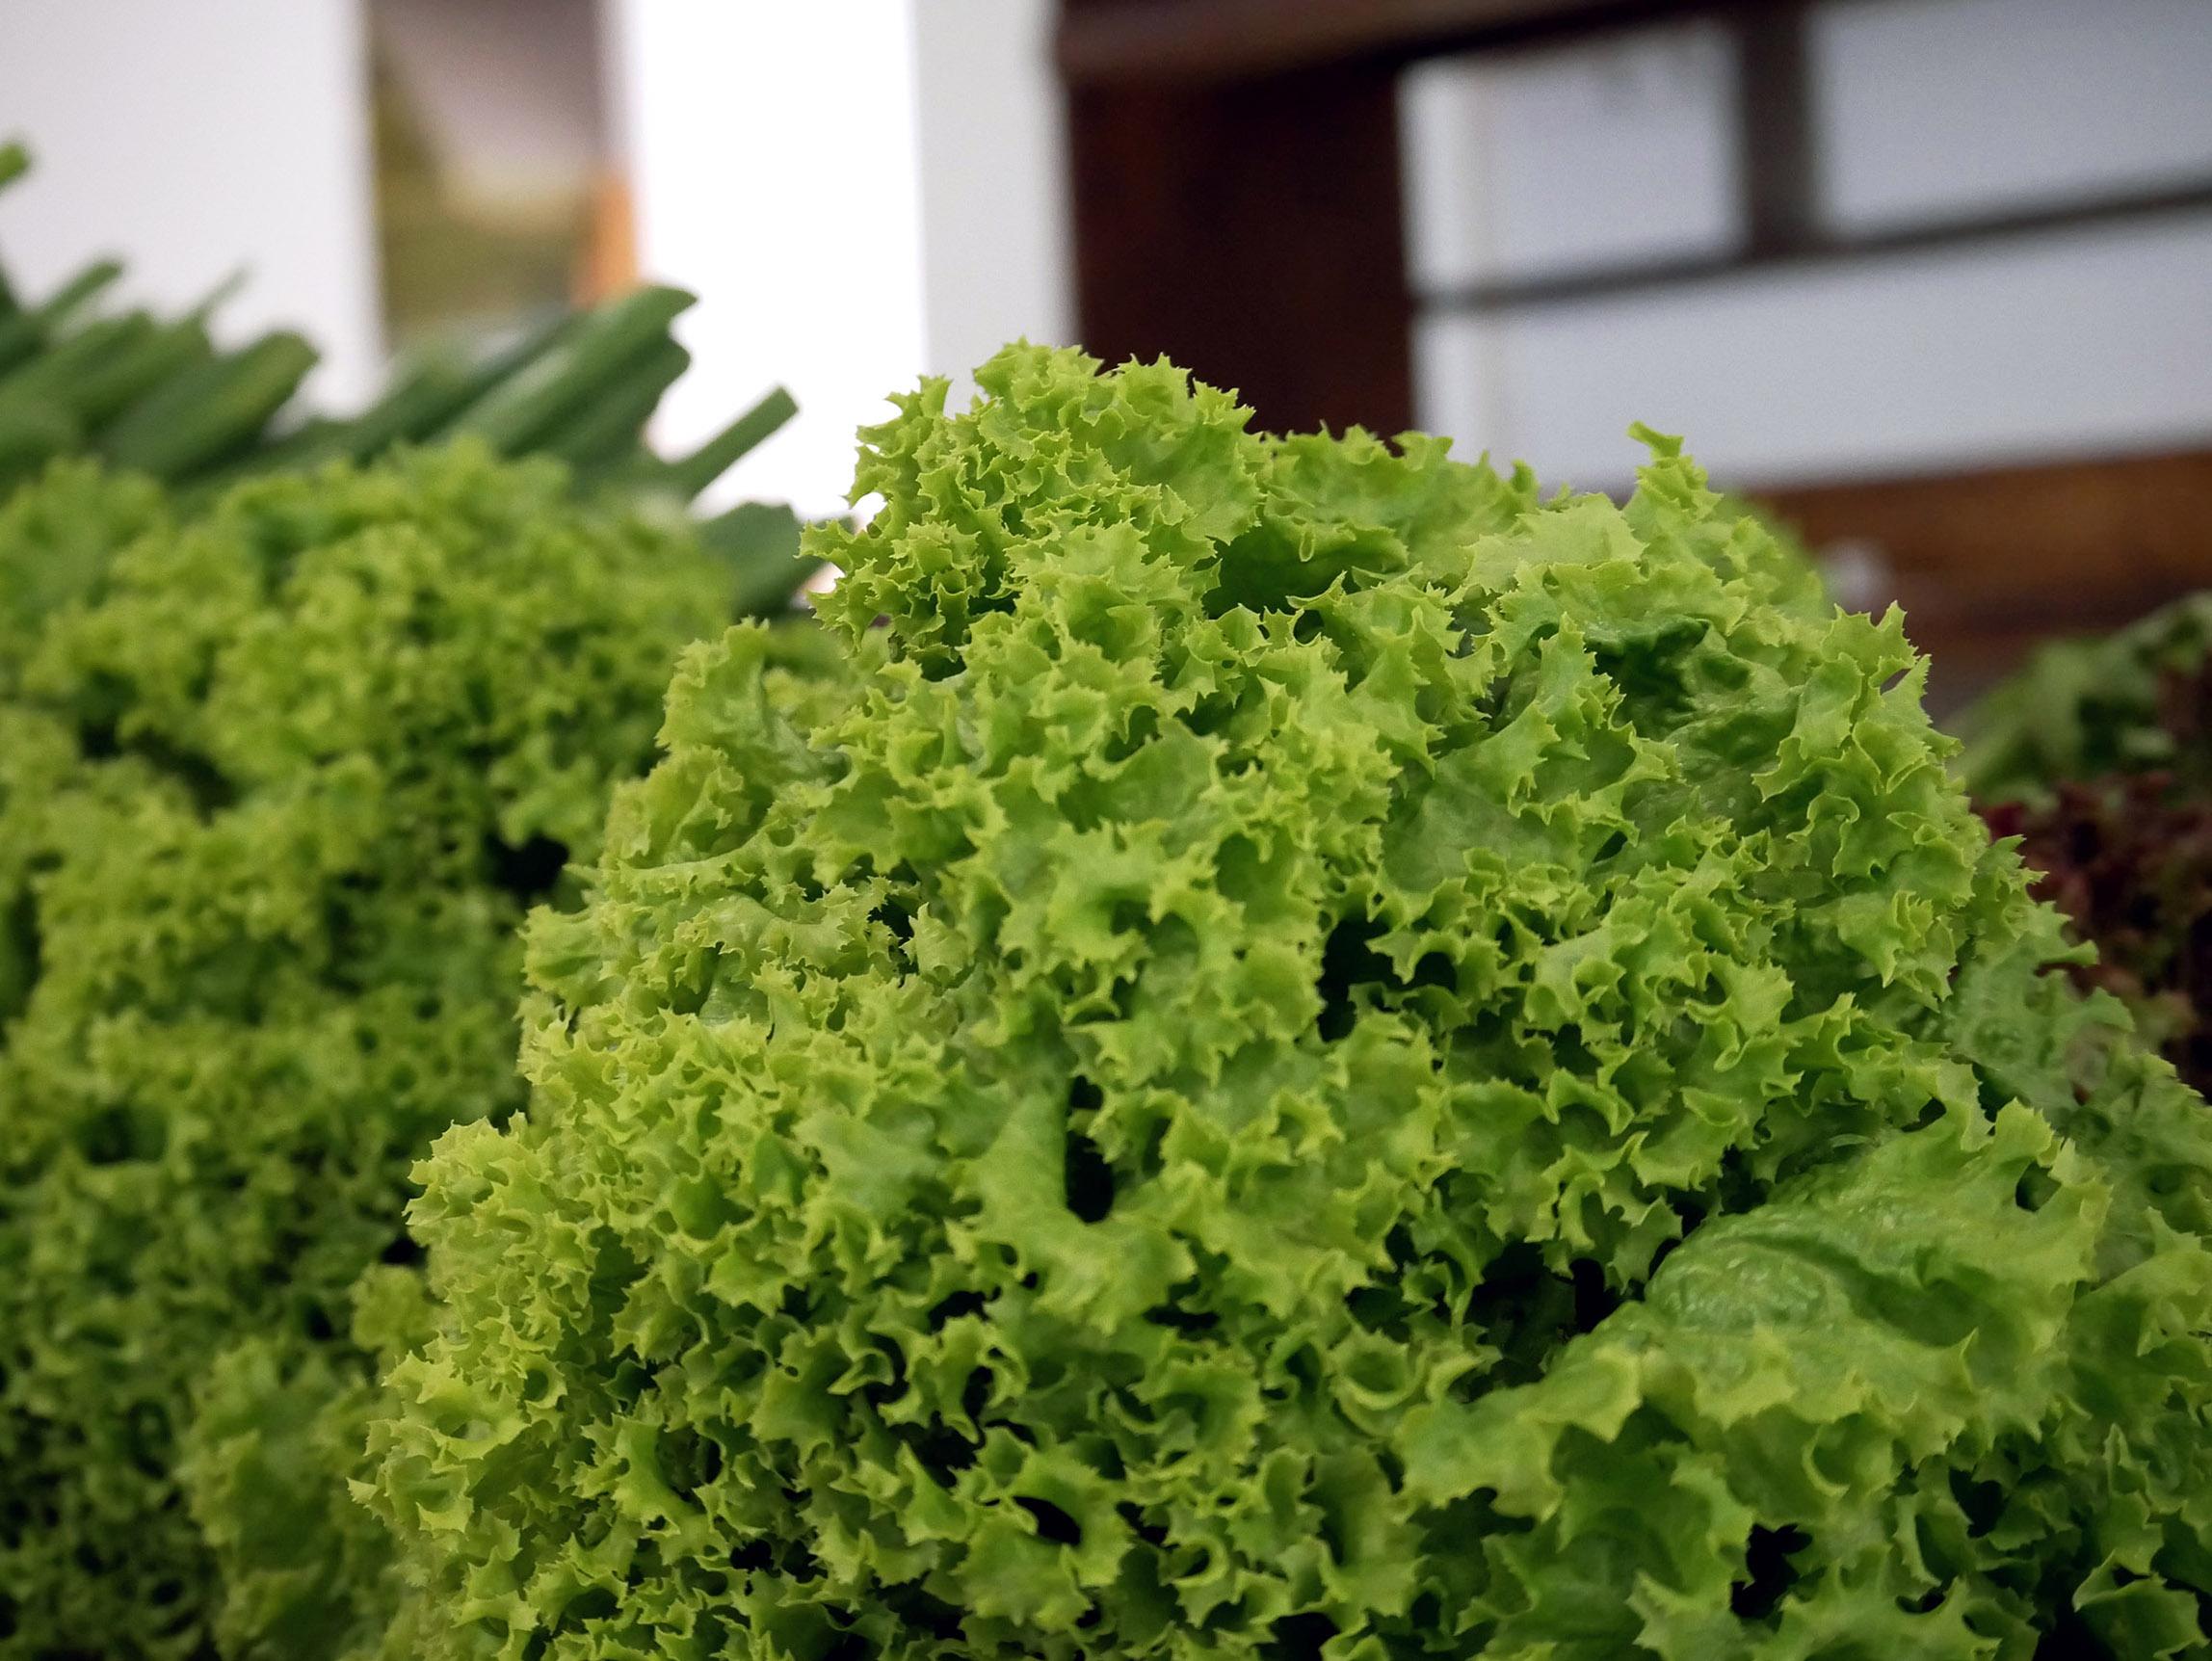 BioRózsa: lollo saláta az Újpesti Biopiacon